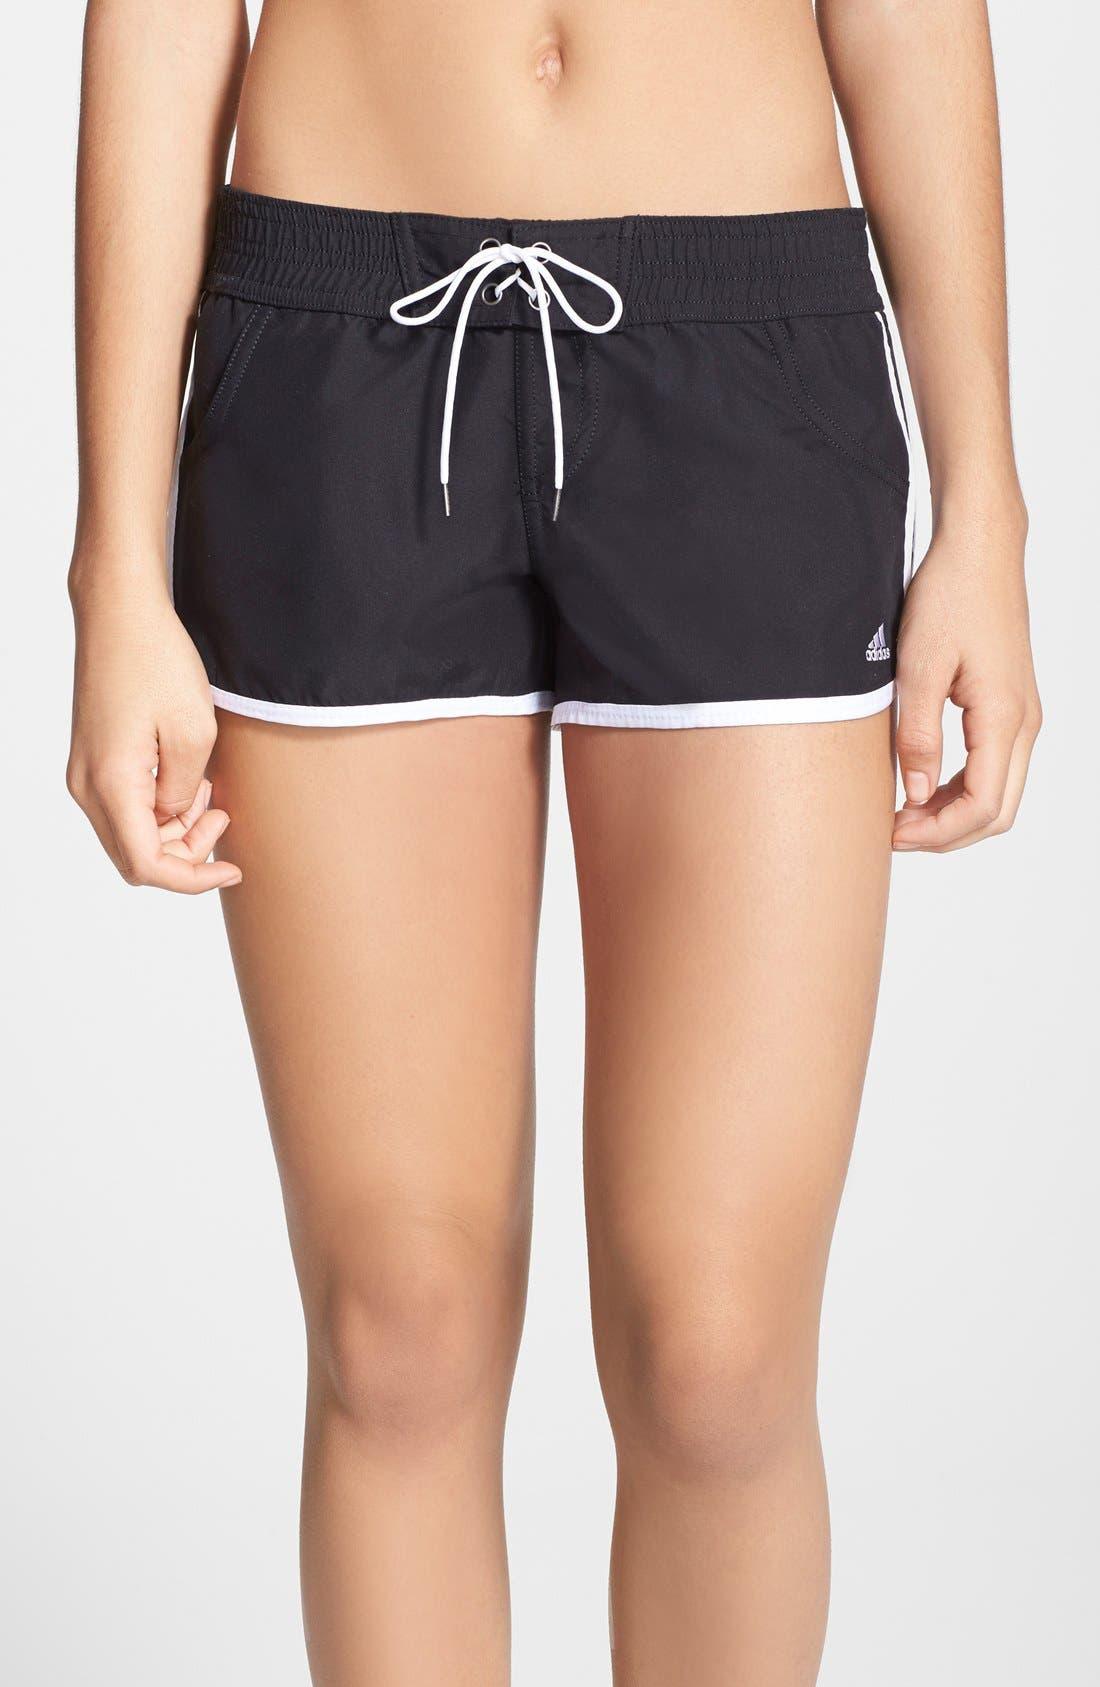 Alternate Image 1 Selected - adidas Tie Waist Board Shorts